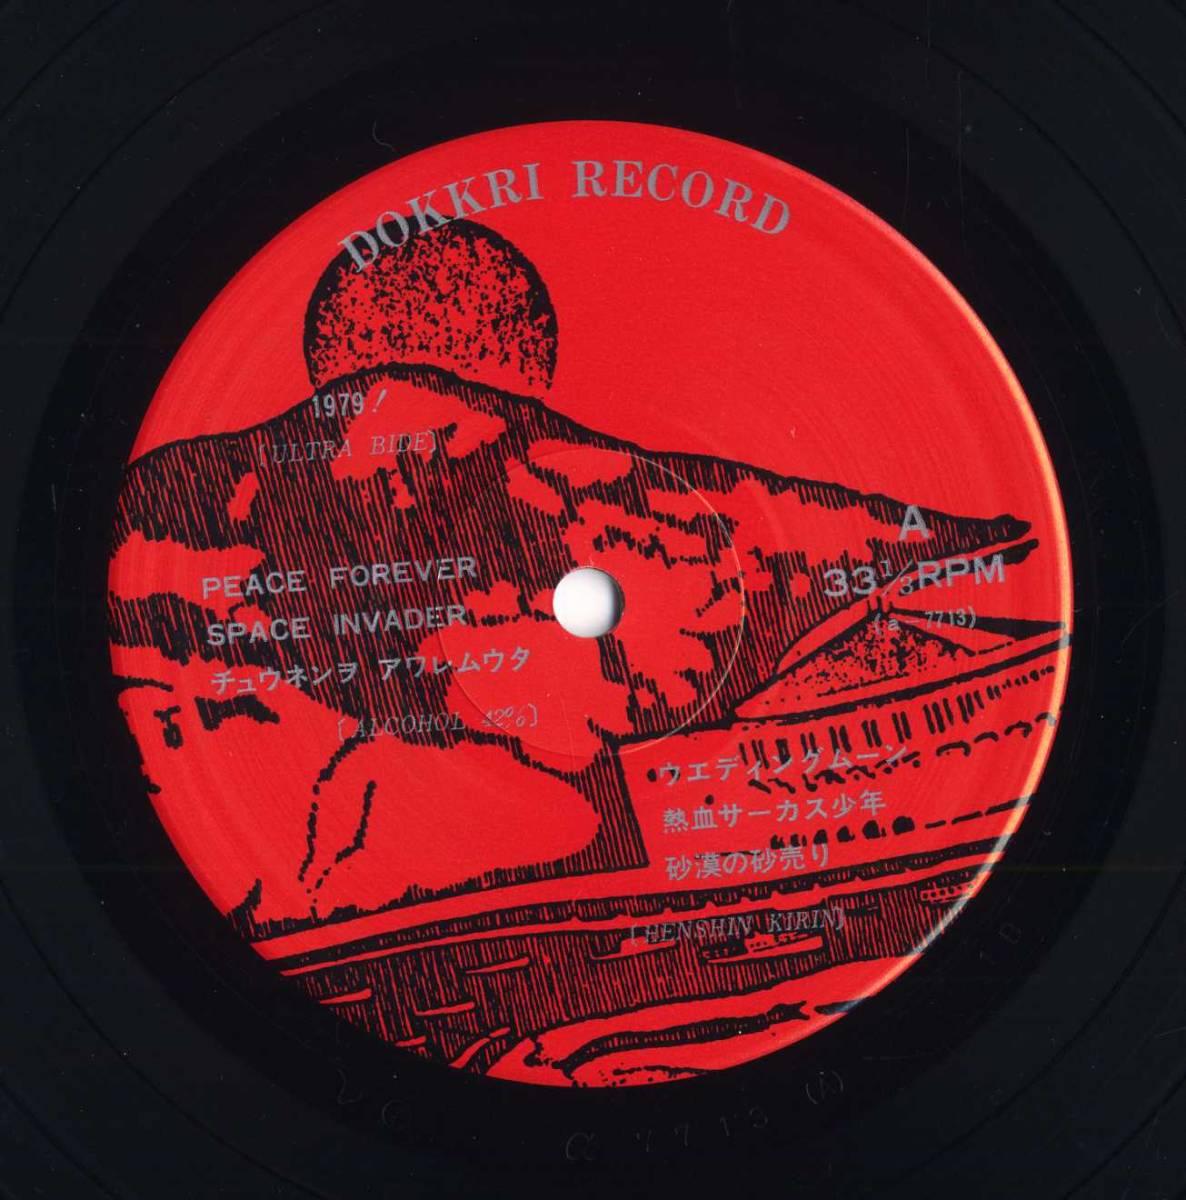 LP★INU他/DOKKIRI RECORDドッキリレコード:自主盤赤JK/町田町蔵★ULTRA BIDE,ALCOHOL42%,変身キリン,CHINESE CLUB/a-7713/限定200枚/PUNK_画像4